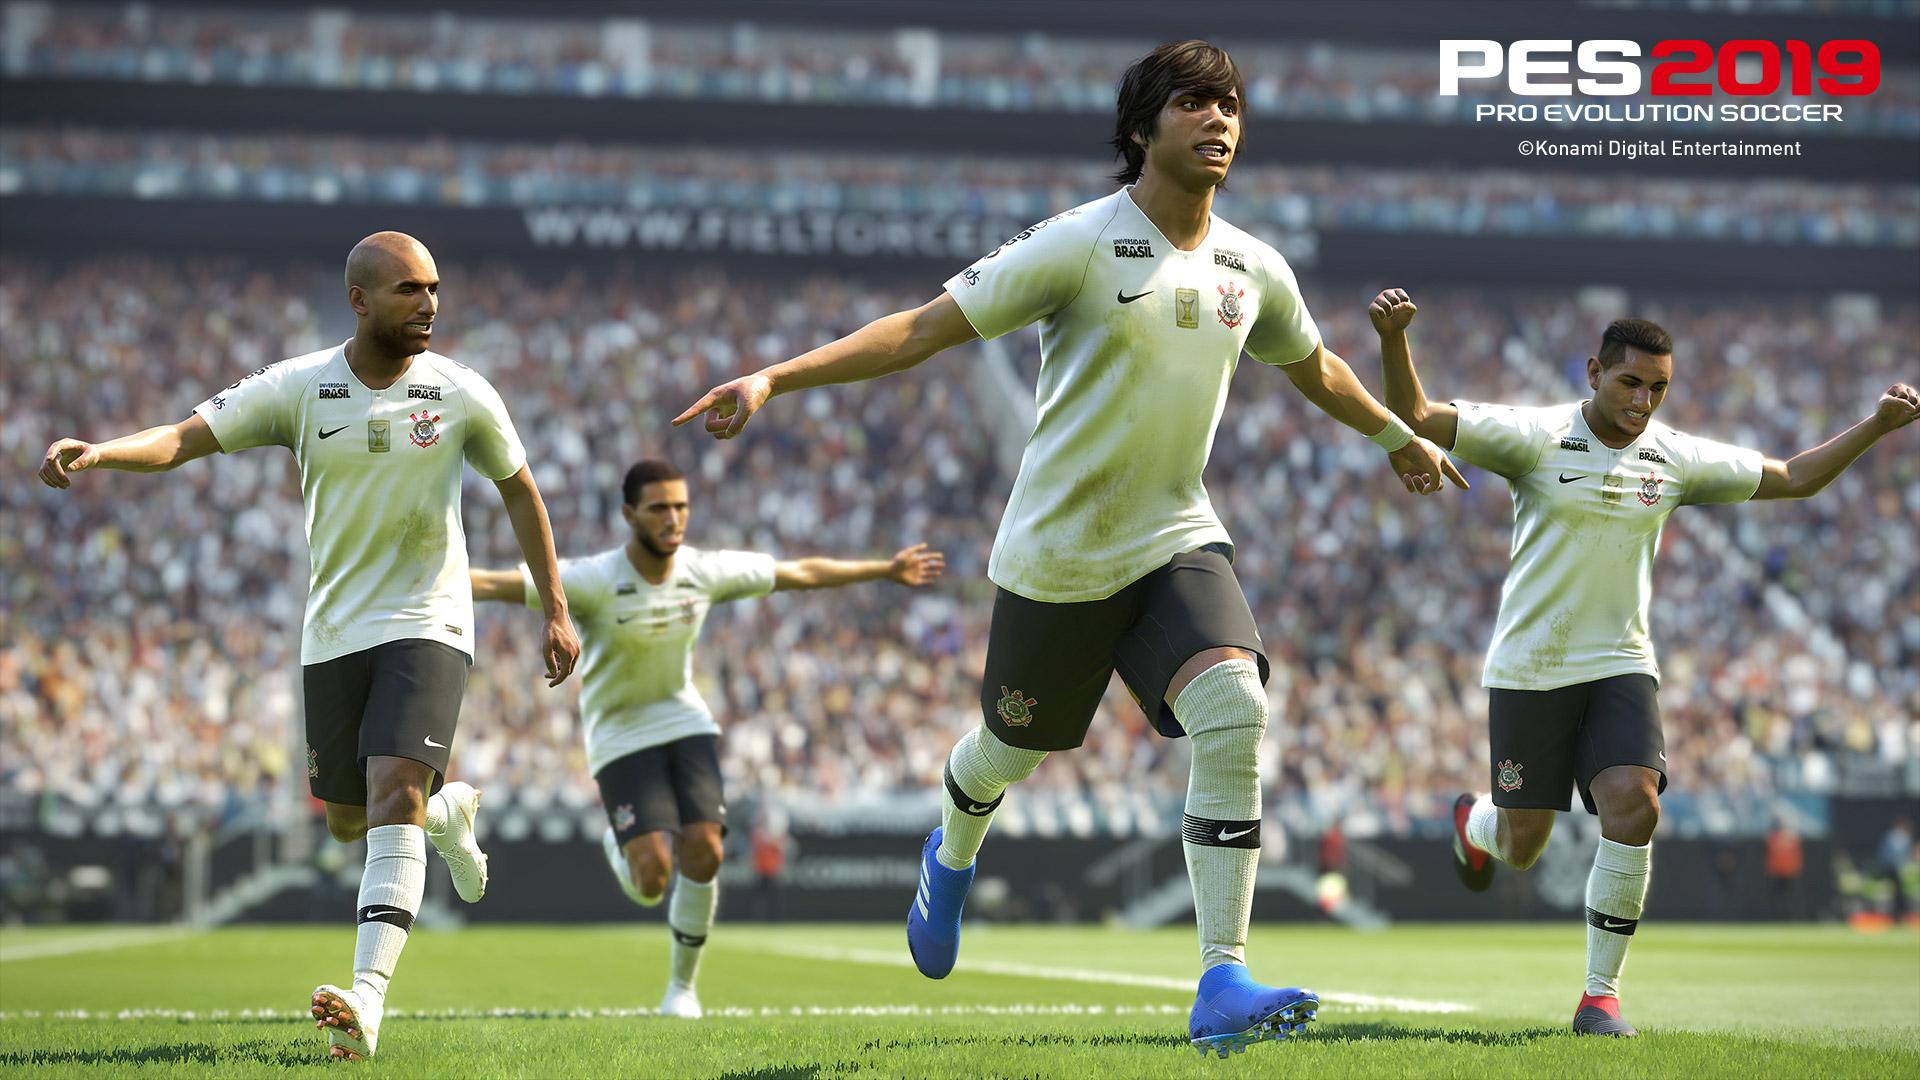 Free Pro Evolution Soccer 2019 Wallpaper in 1920x1080